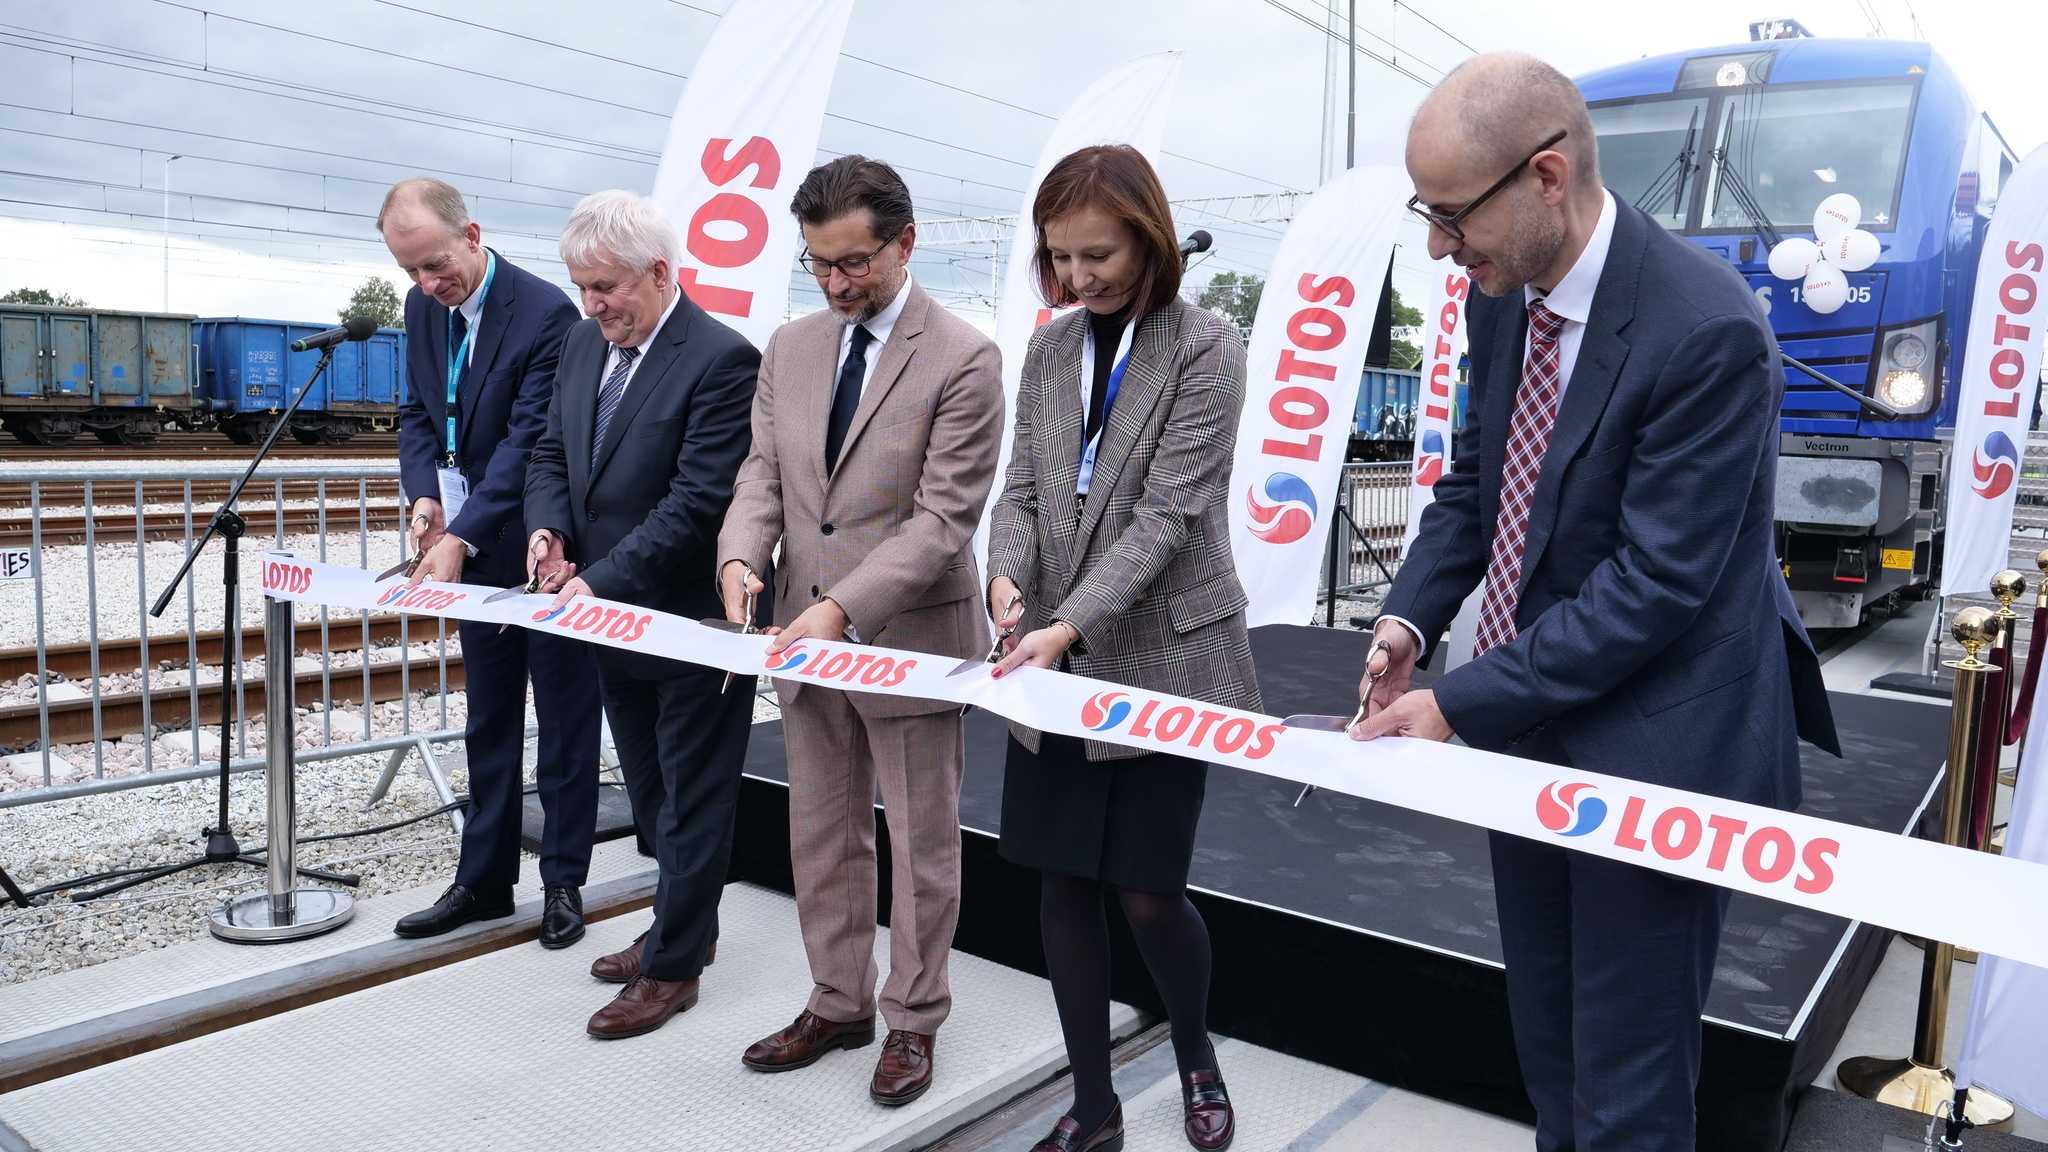 Lotos Kolej unveils its Vectron MS locomotive